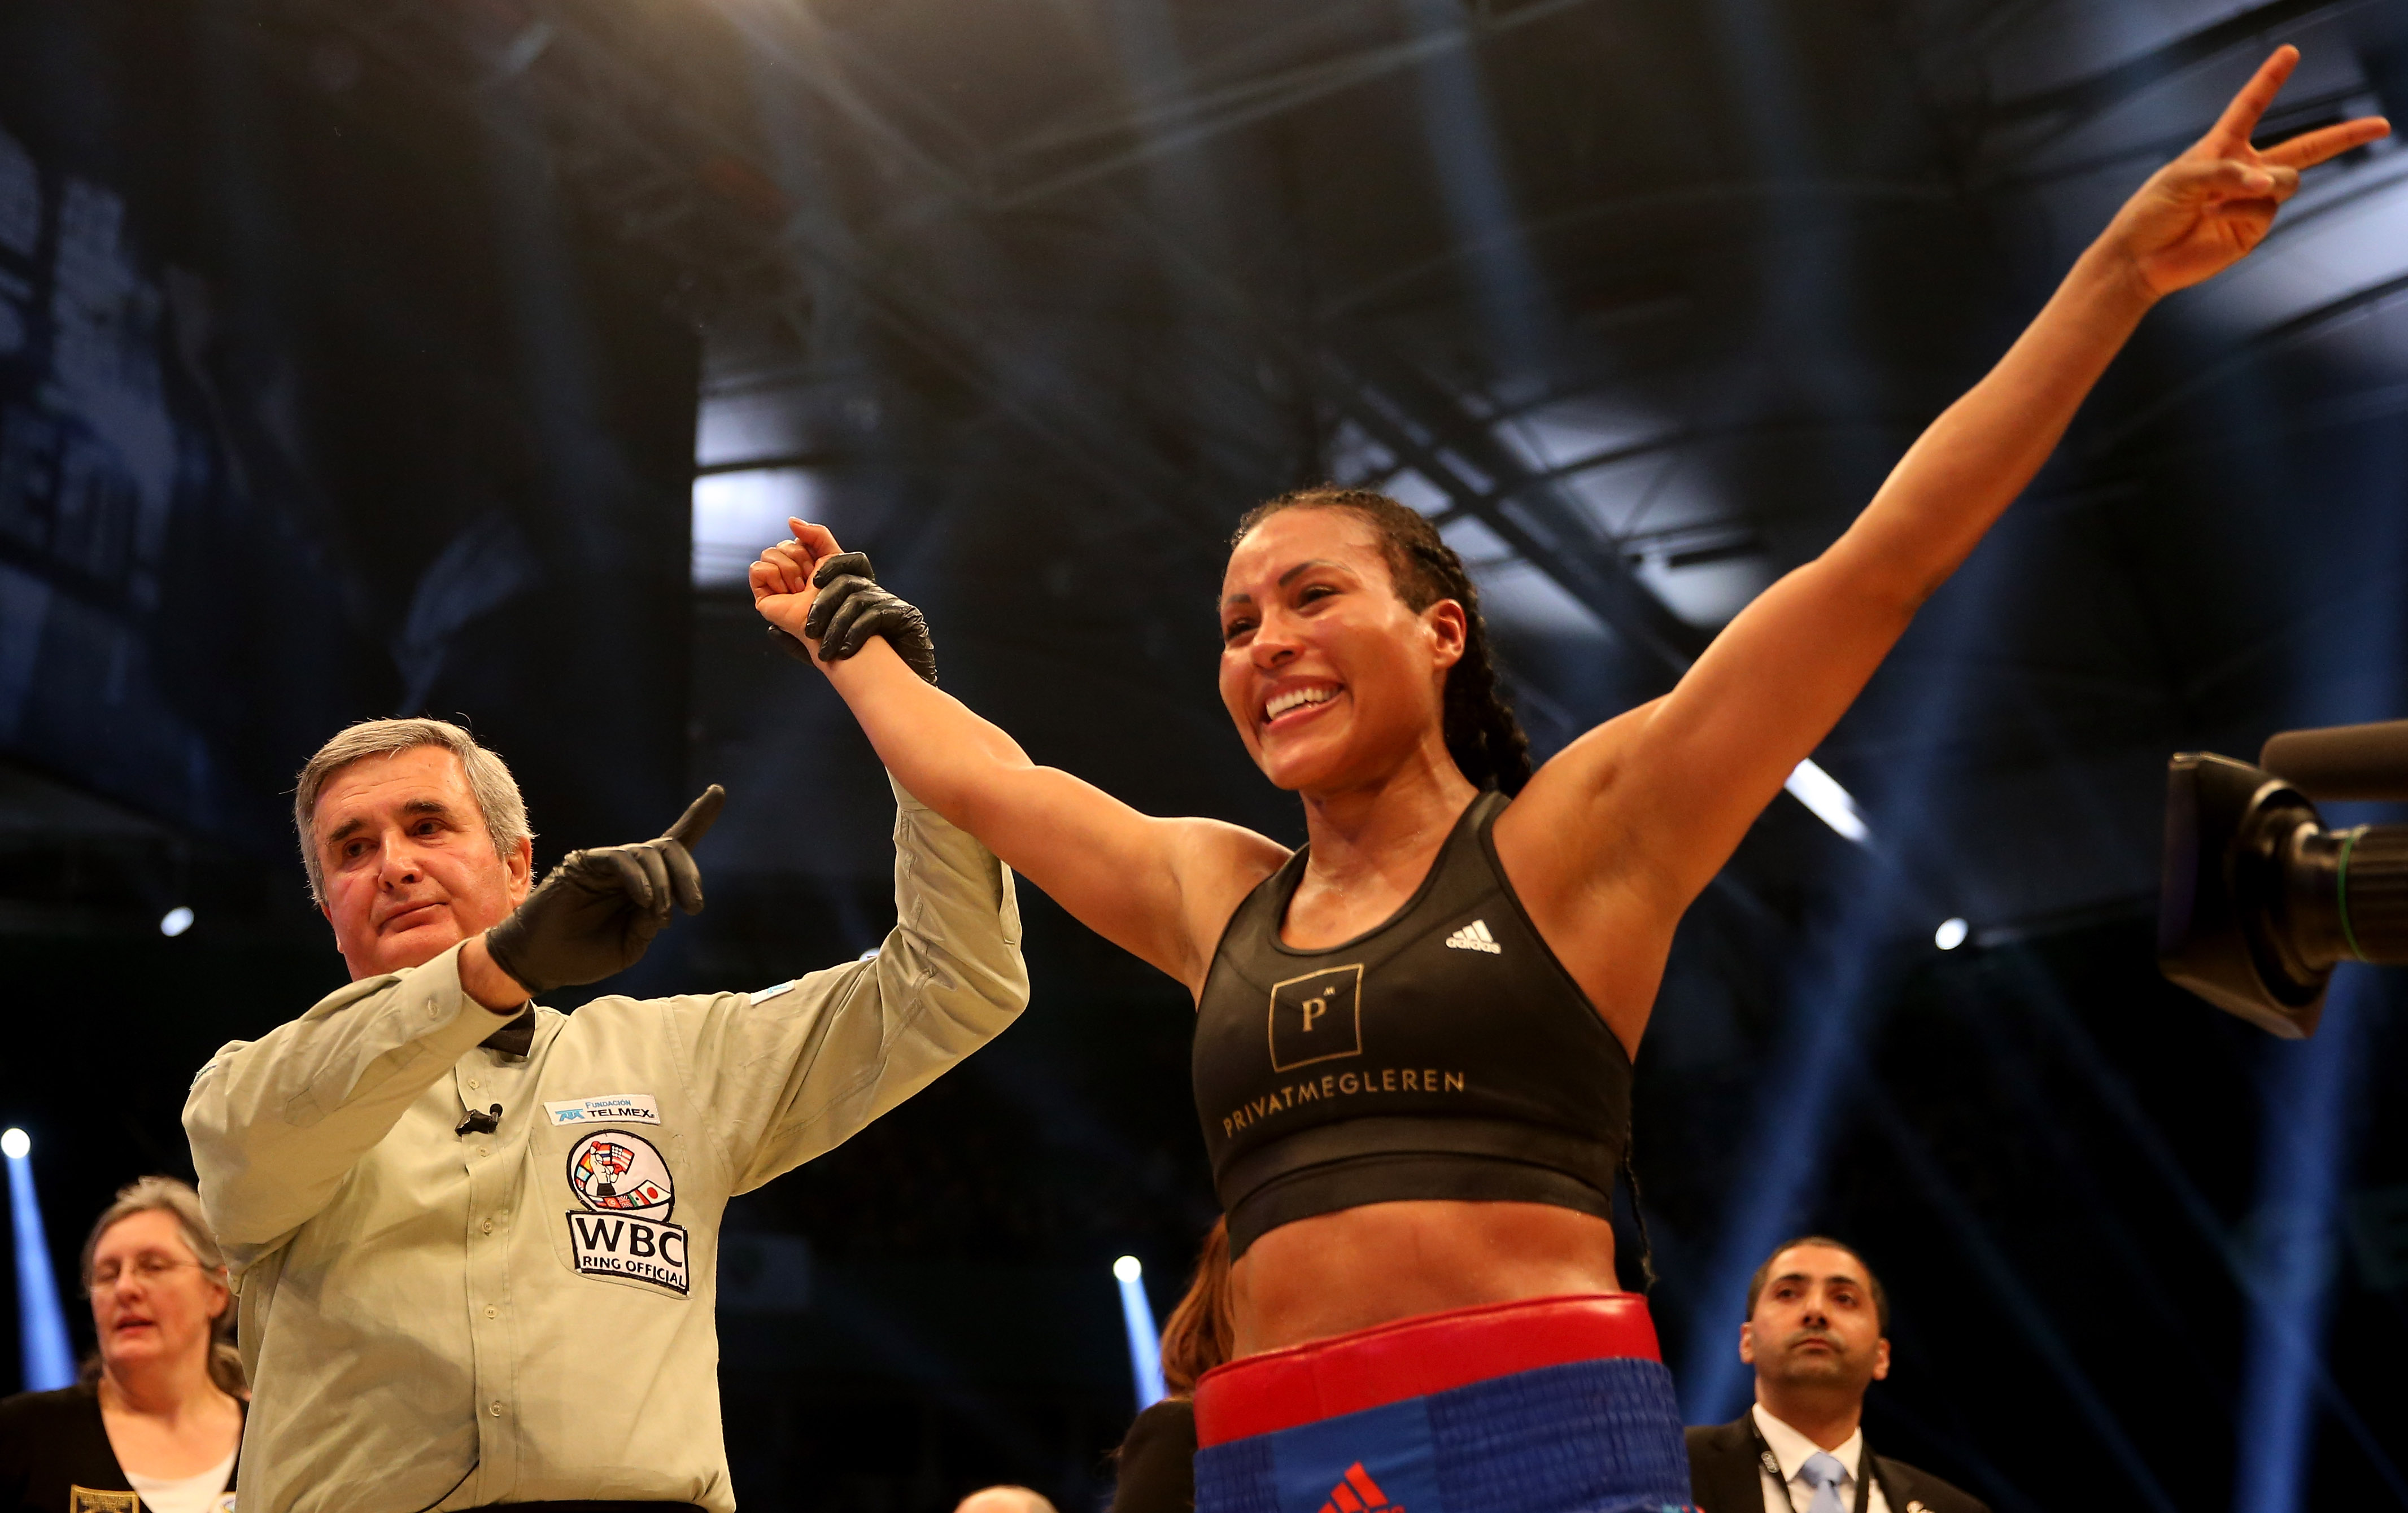 Boxer Cecilia Braekhus